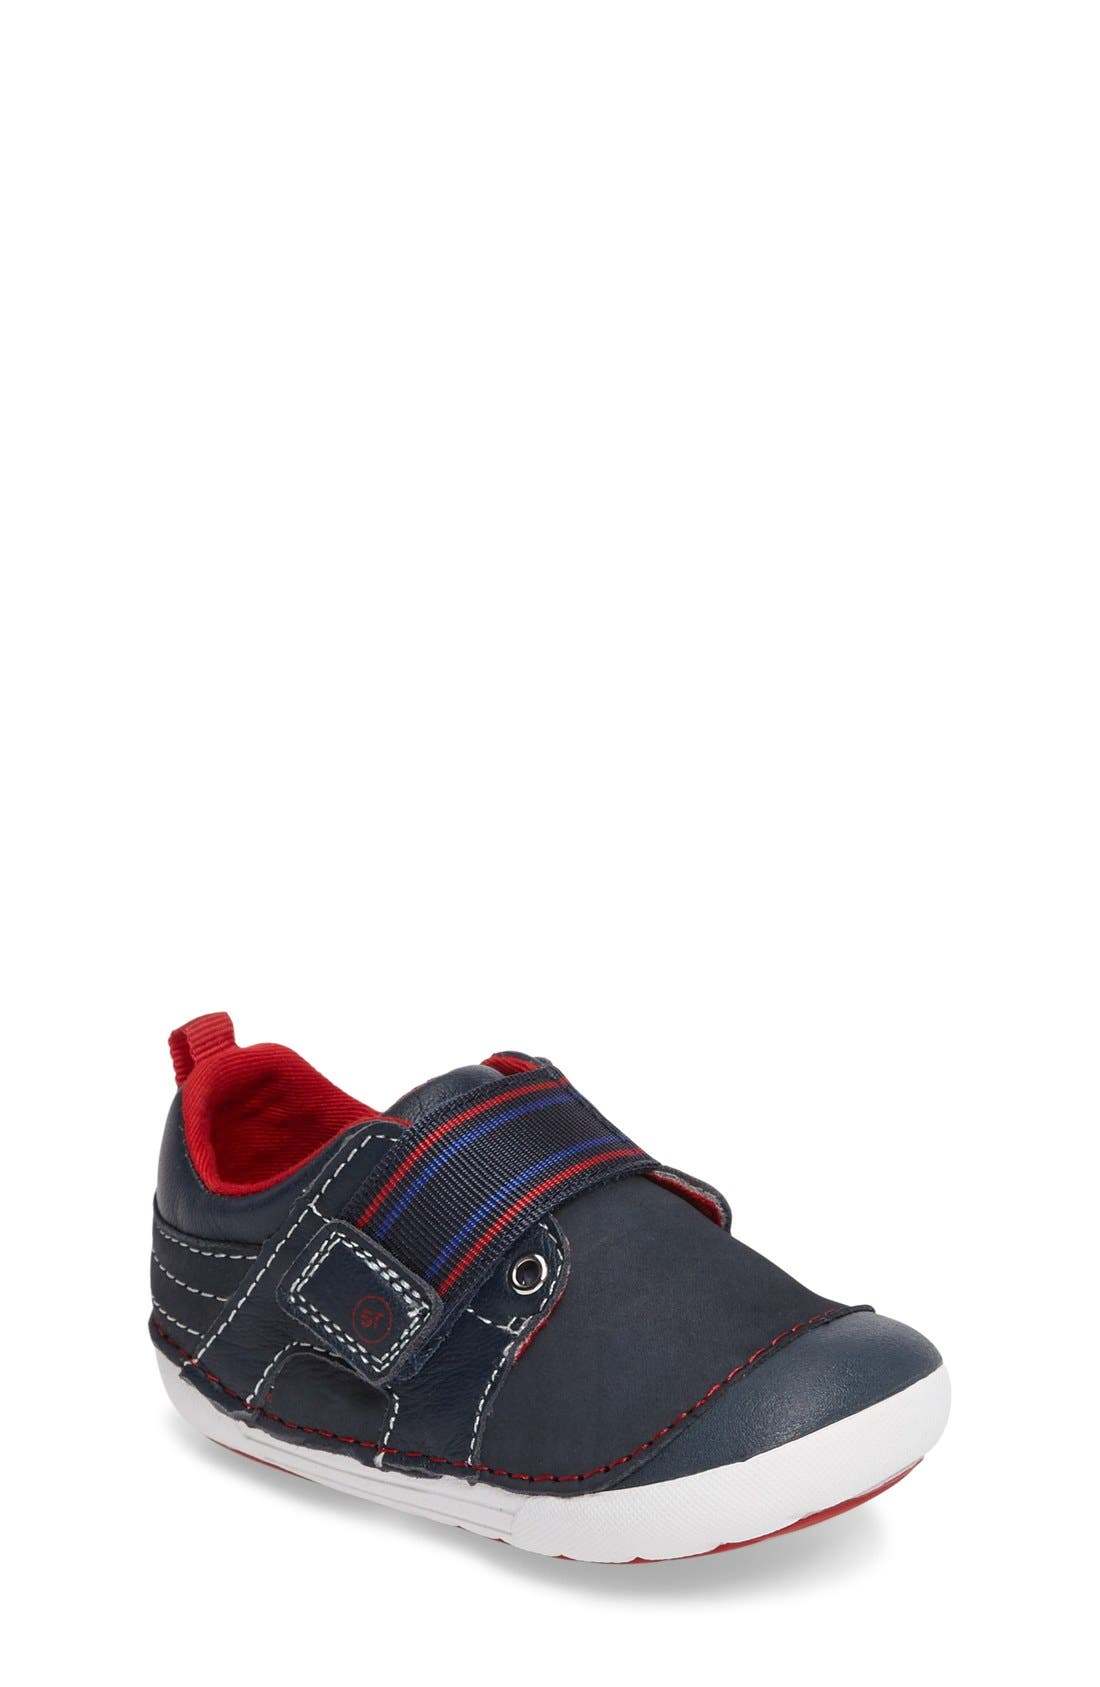 Soft Motion<sup>™</sup> Cameron Sneaker,                             Main thumbnail 1, color,                             Navy